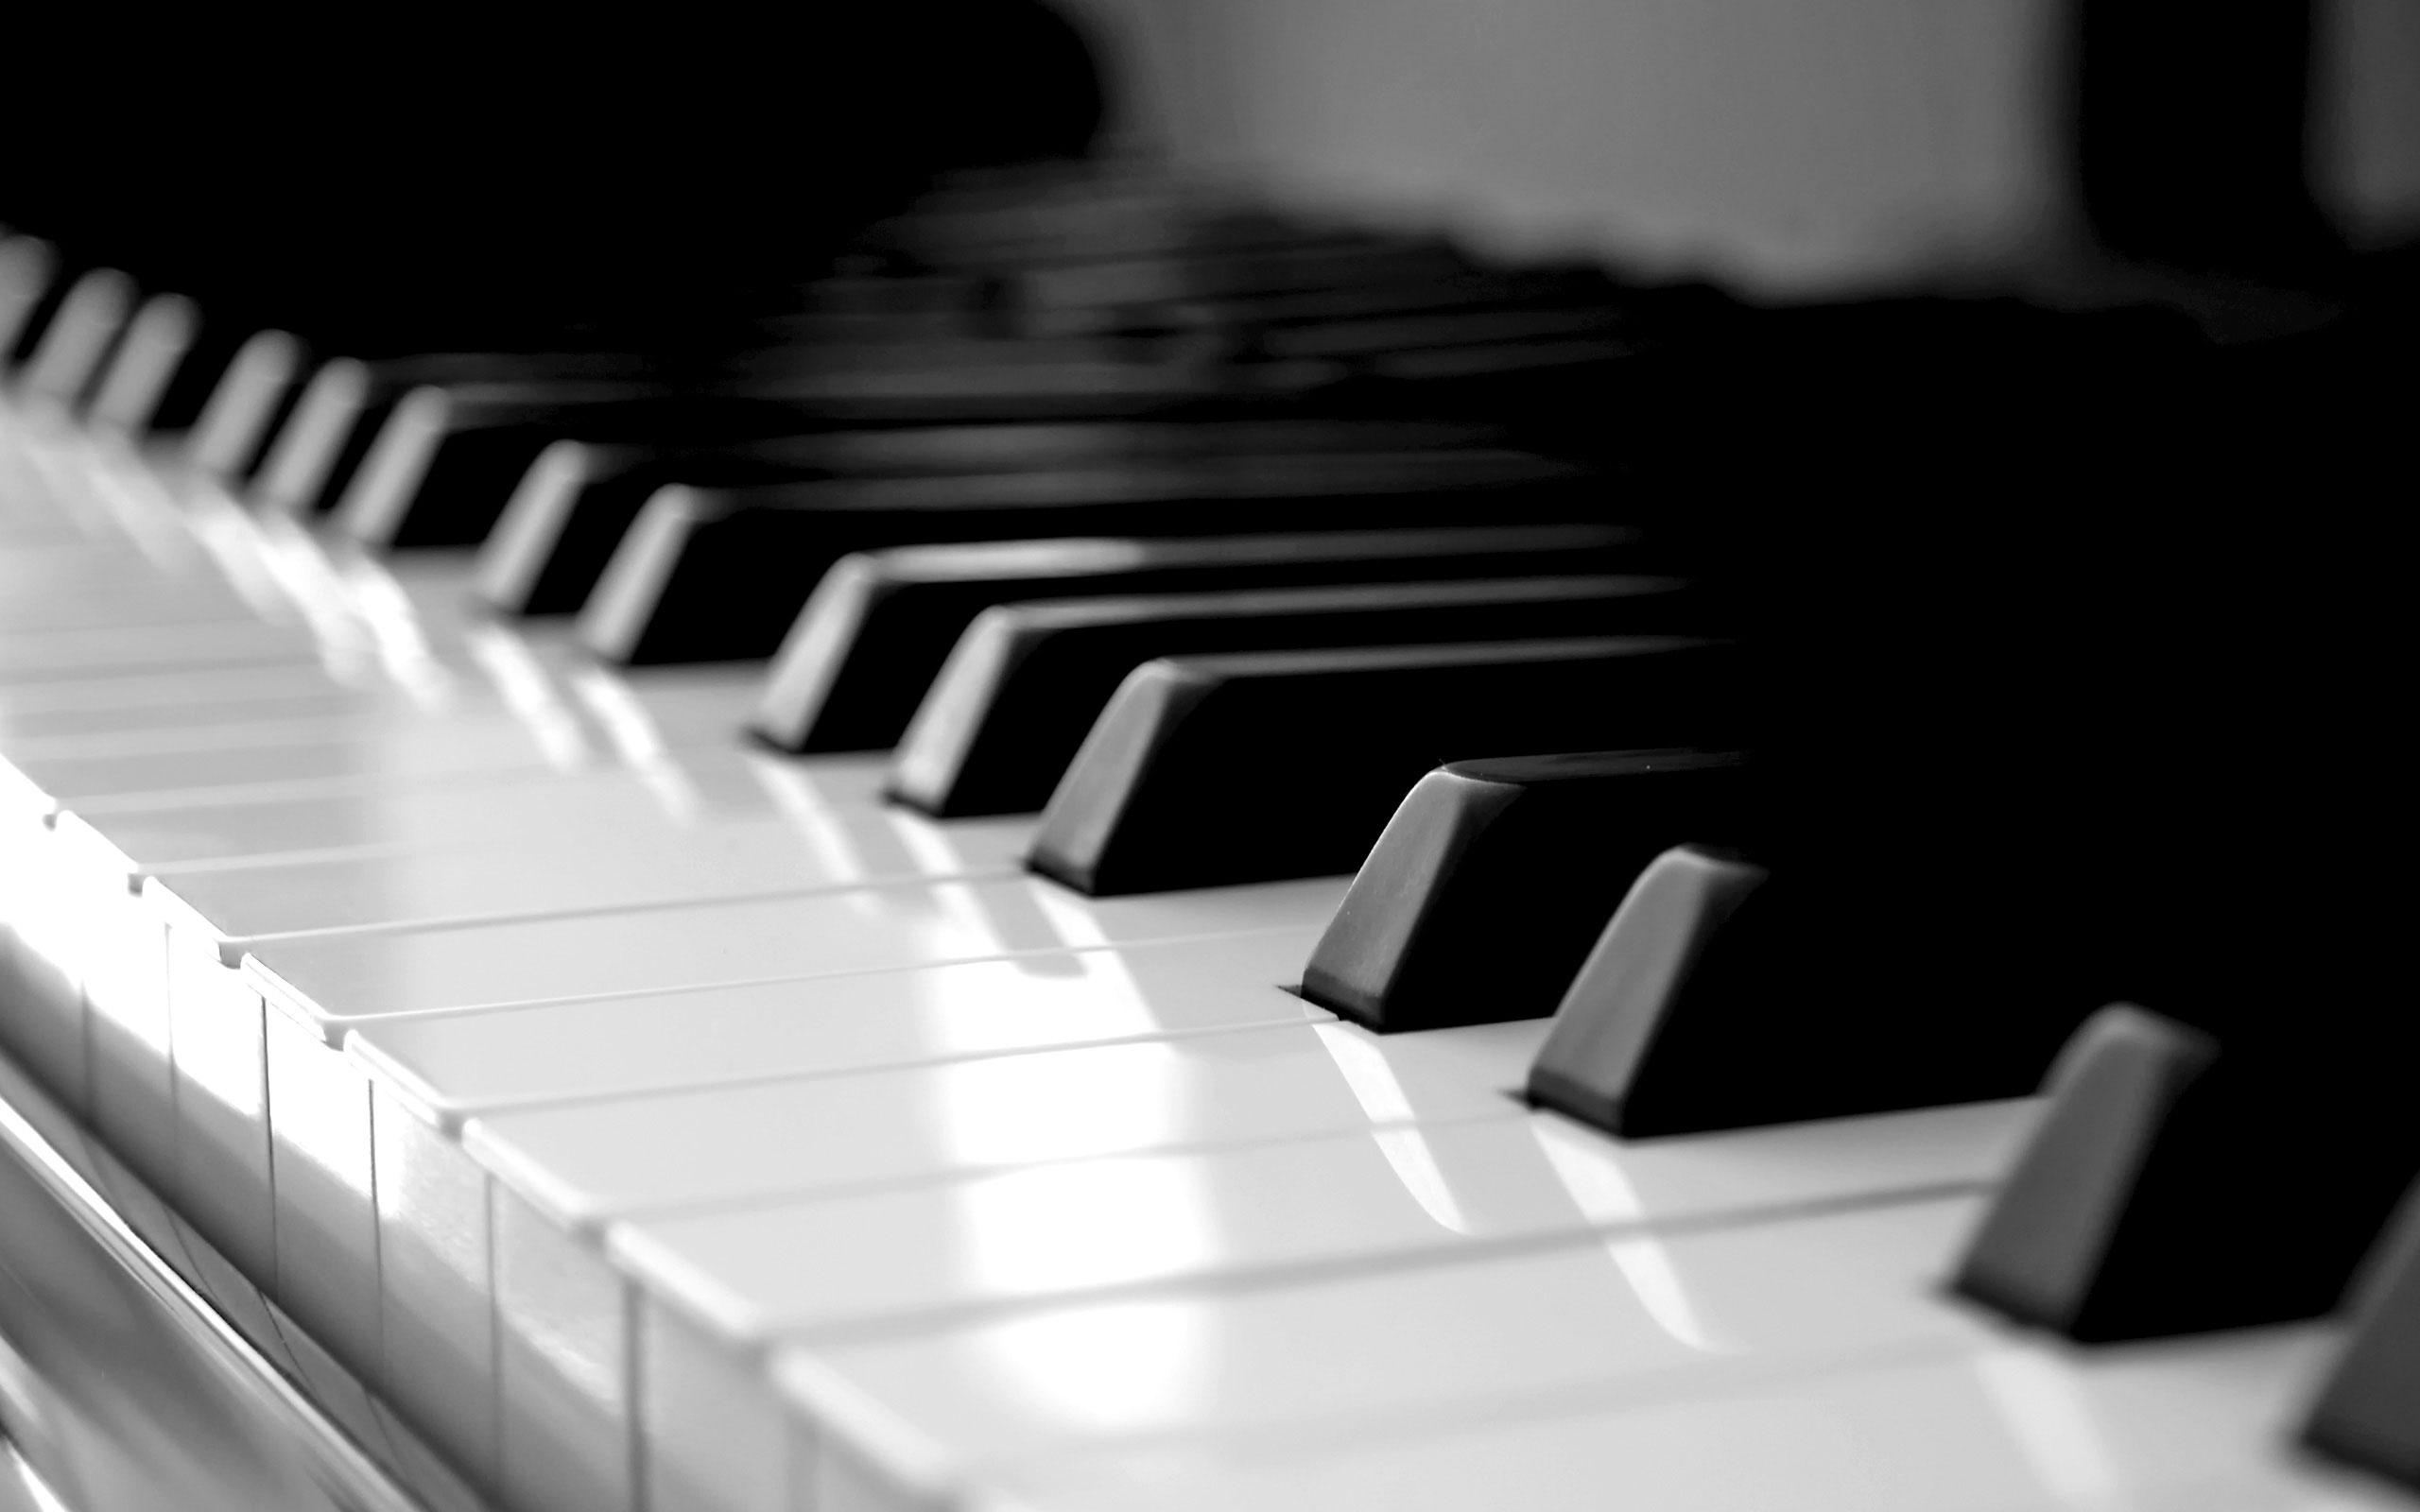 ONTSPANNEN PIANO SPELEN